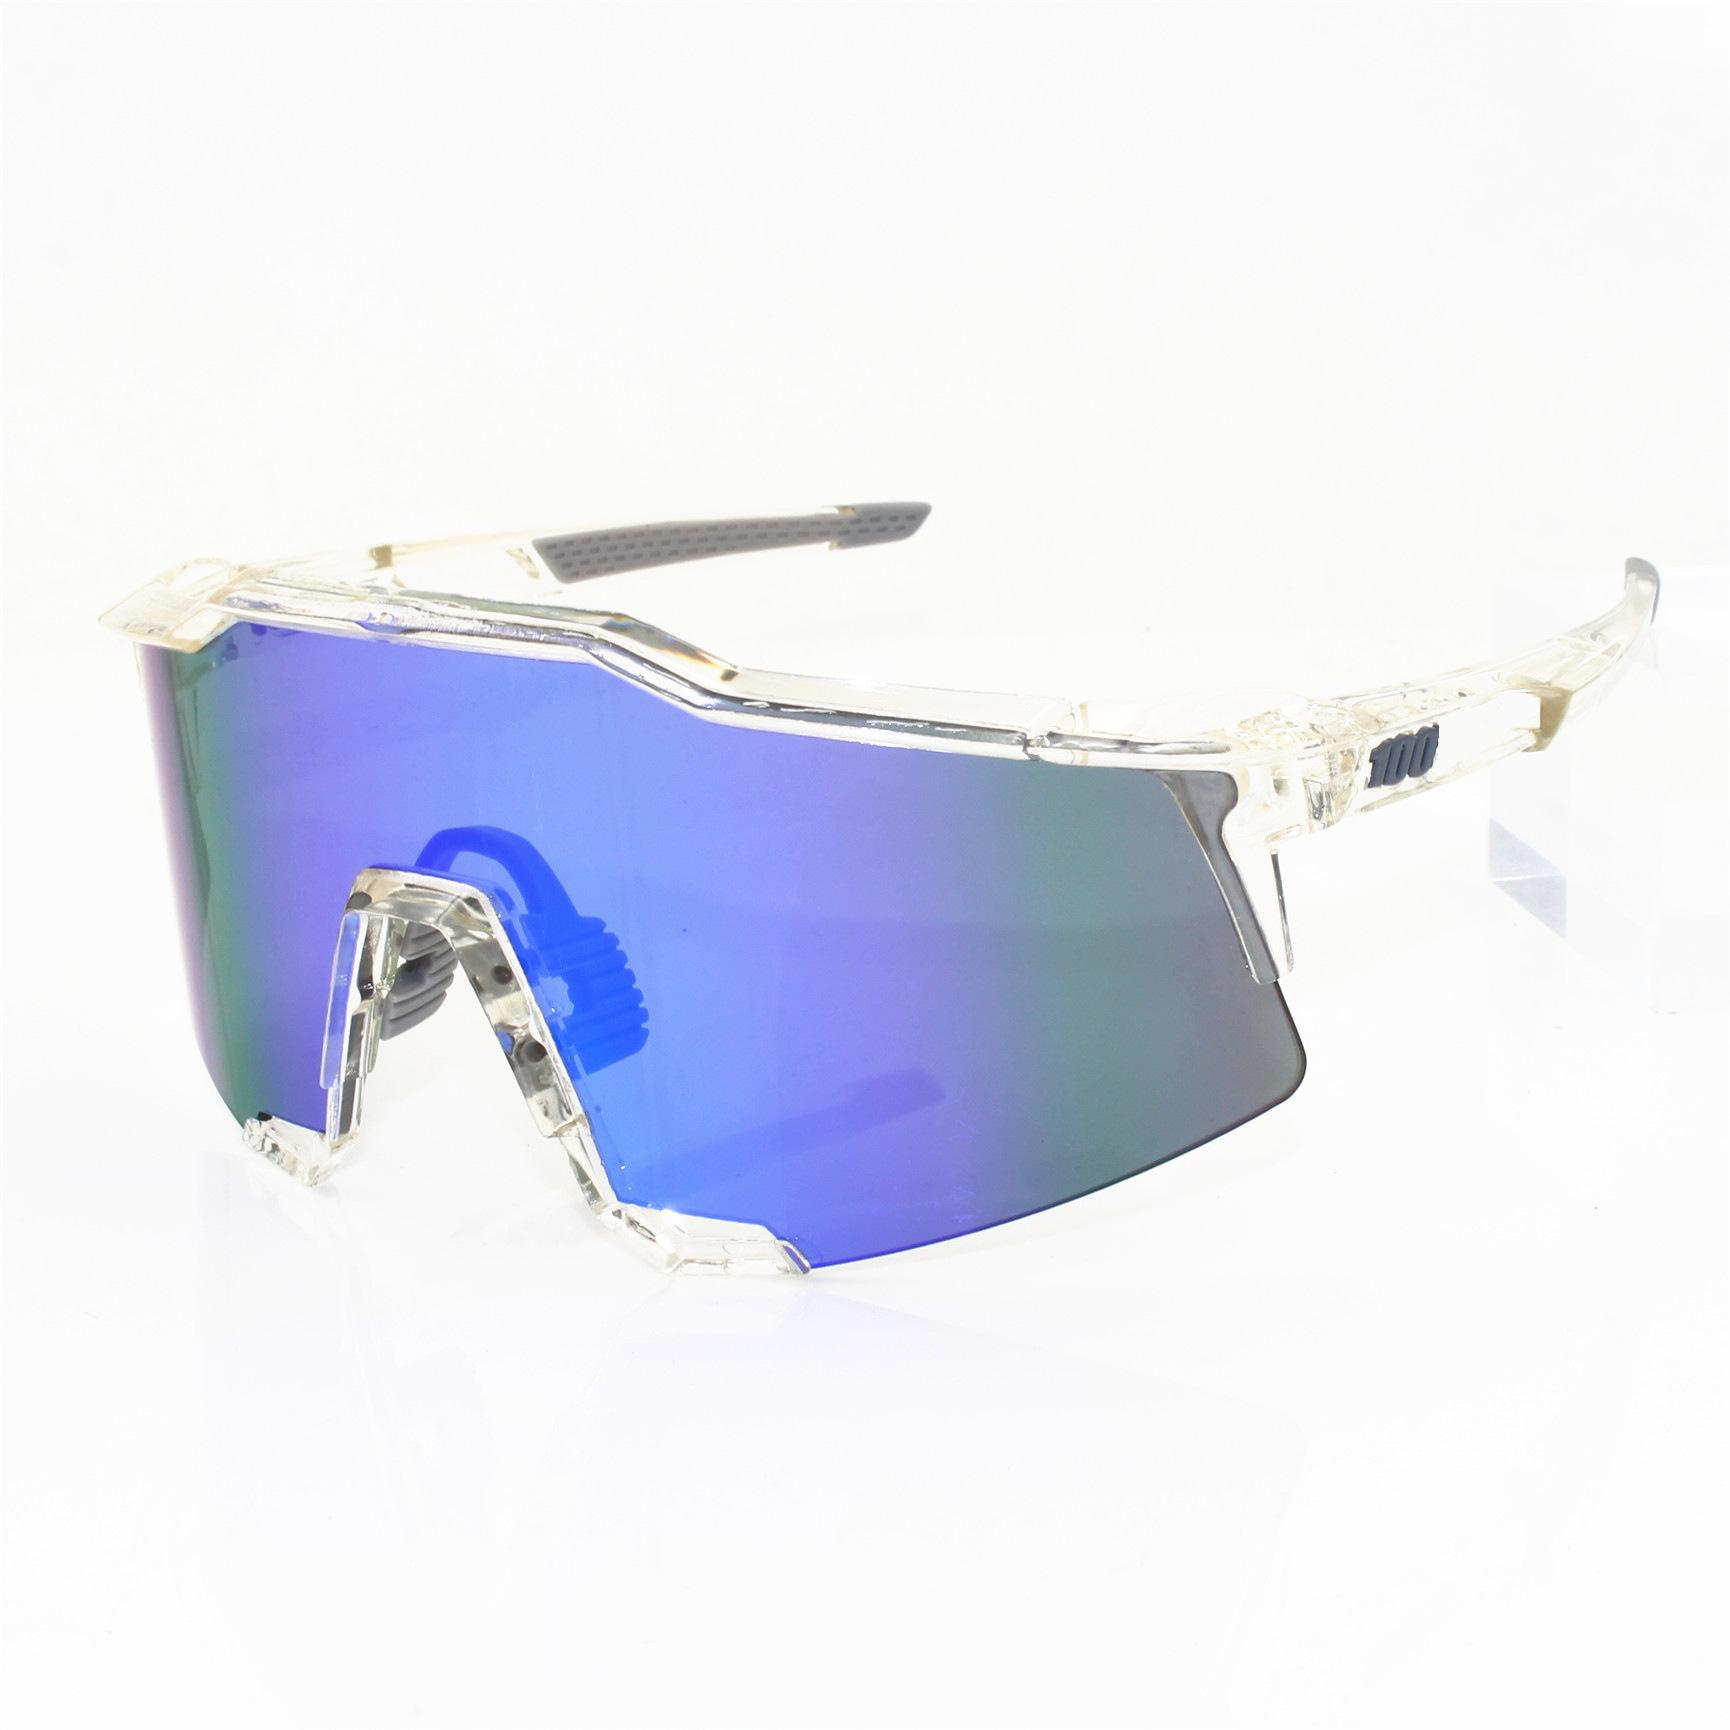 Sagan Glasses Sunglasses Riding Glasses Men And Women Outdoor Sports Fishing TR90  6